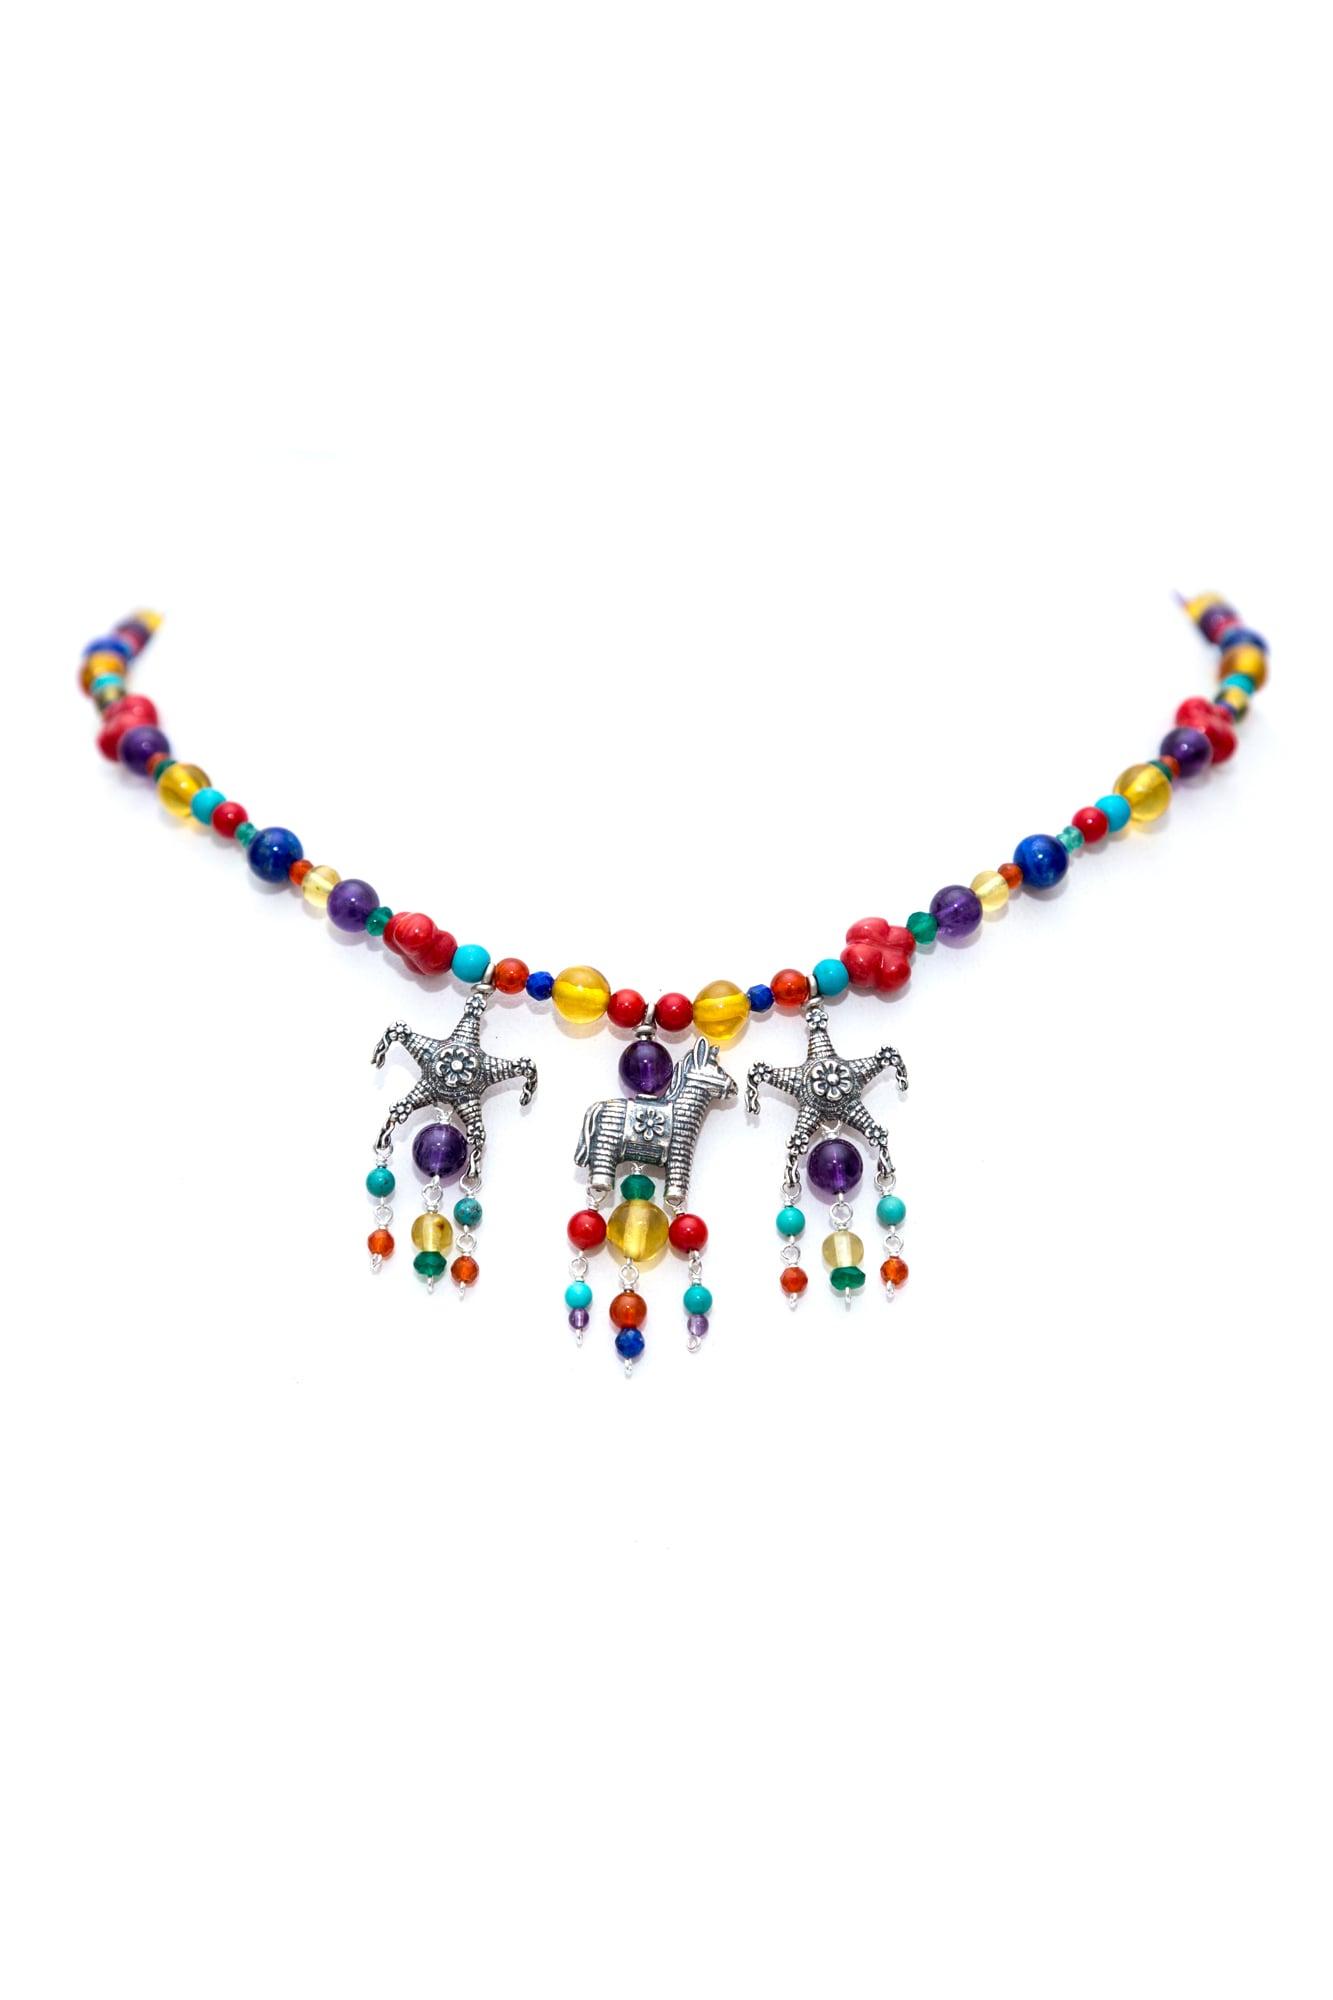 joyas mexicanas gabriela sanchez collar juguetes de confeti